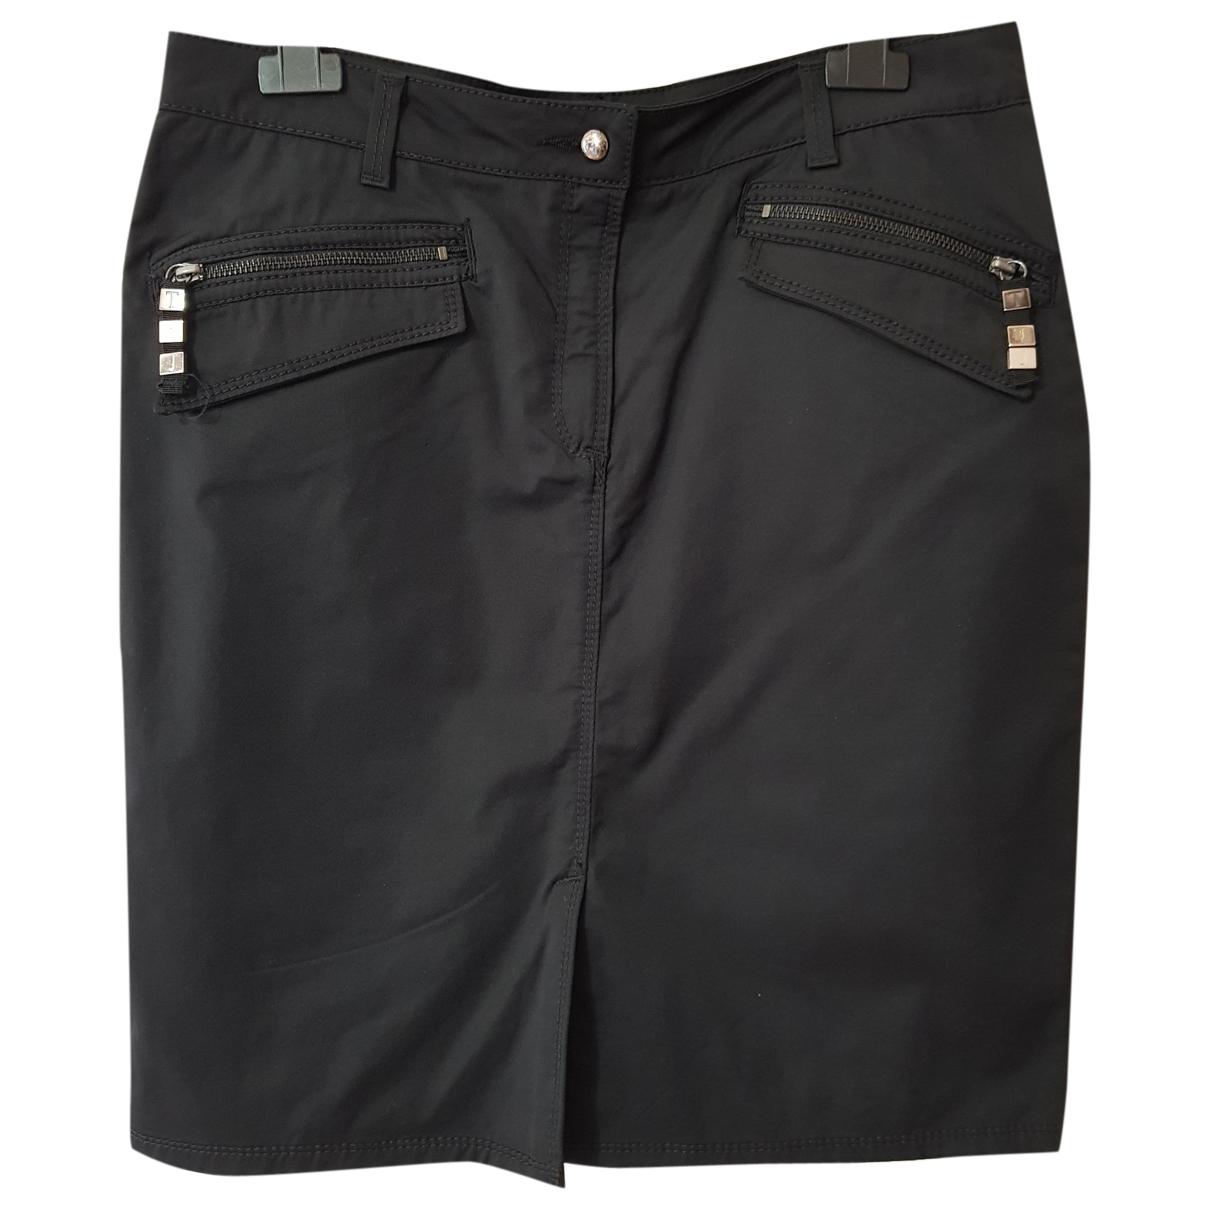 Trussardi Jeans \N Black Cotton skirt for Women 46 IT